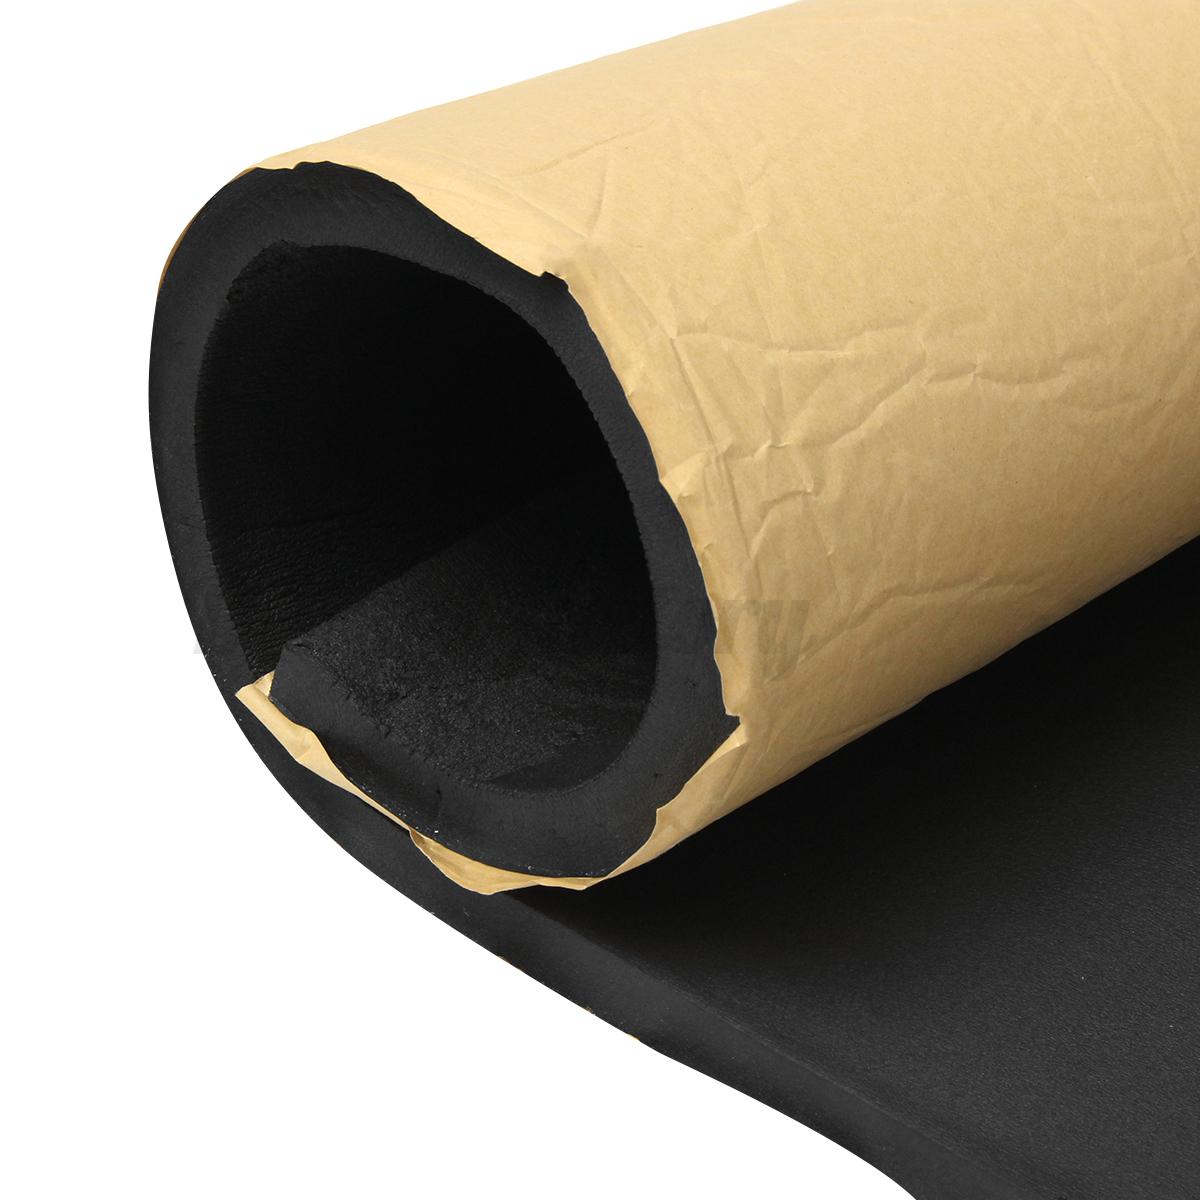 Foam Sound Insulation Panels : Ft mm car sound proofing deadening insulation roll